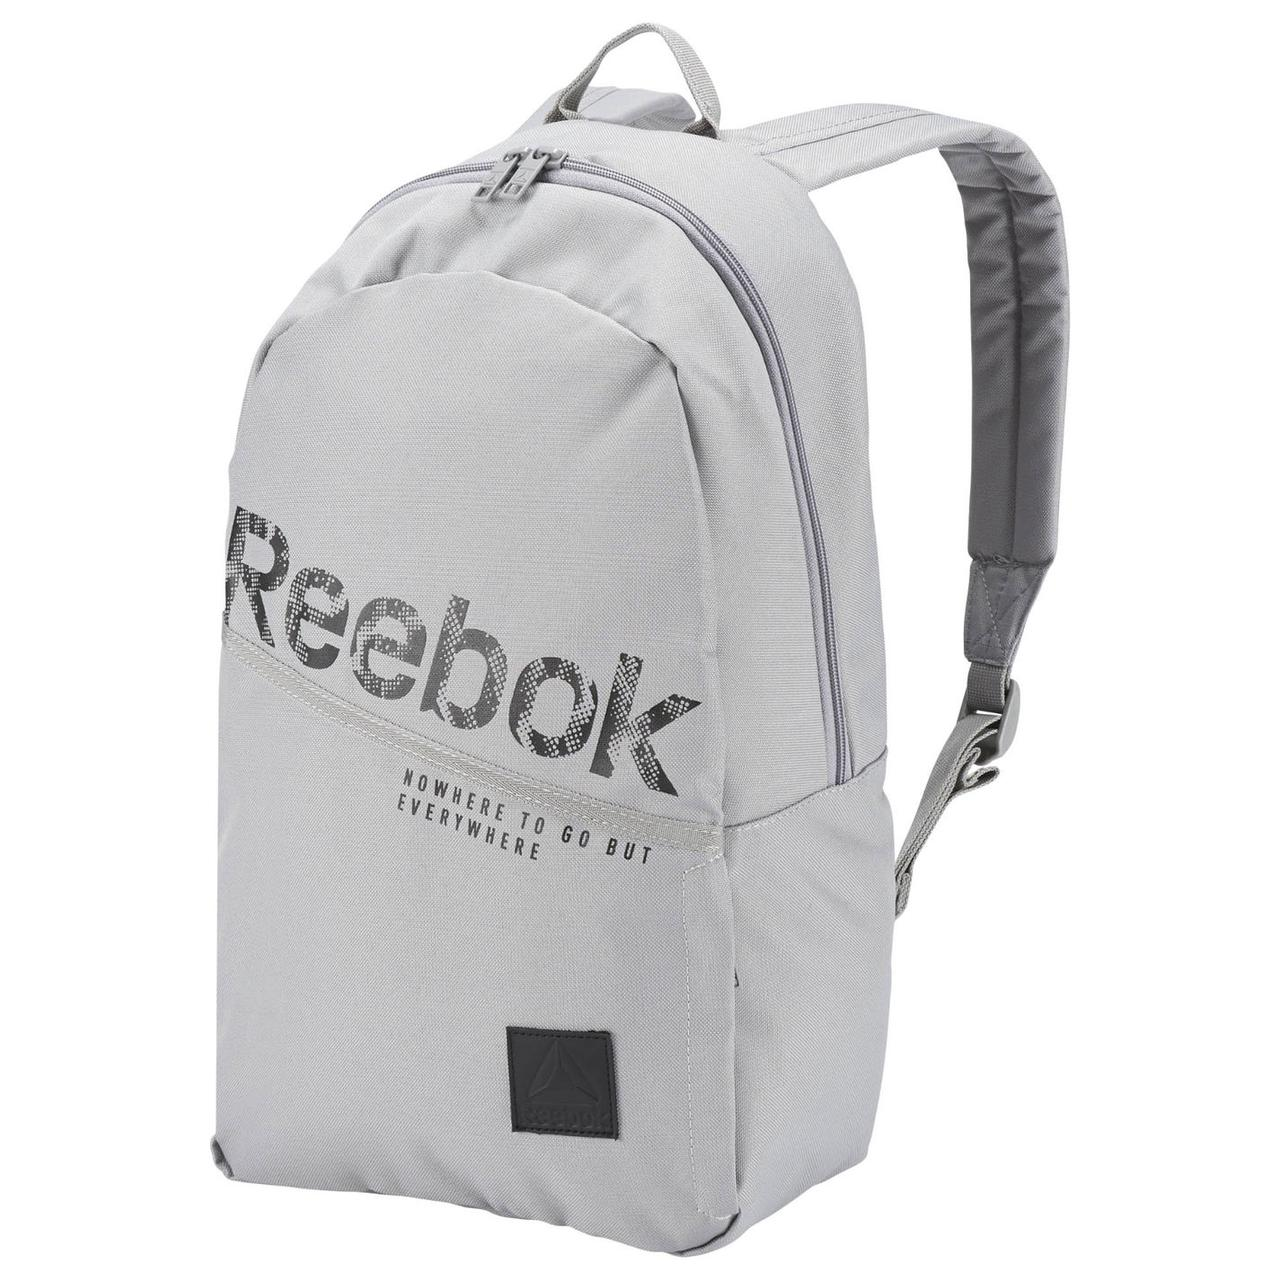 c78f3c23 Рюкзак Reebok Style Found Follow Grip Bag Grey Оригинал спортивный серый